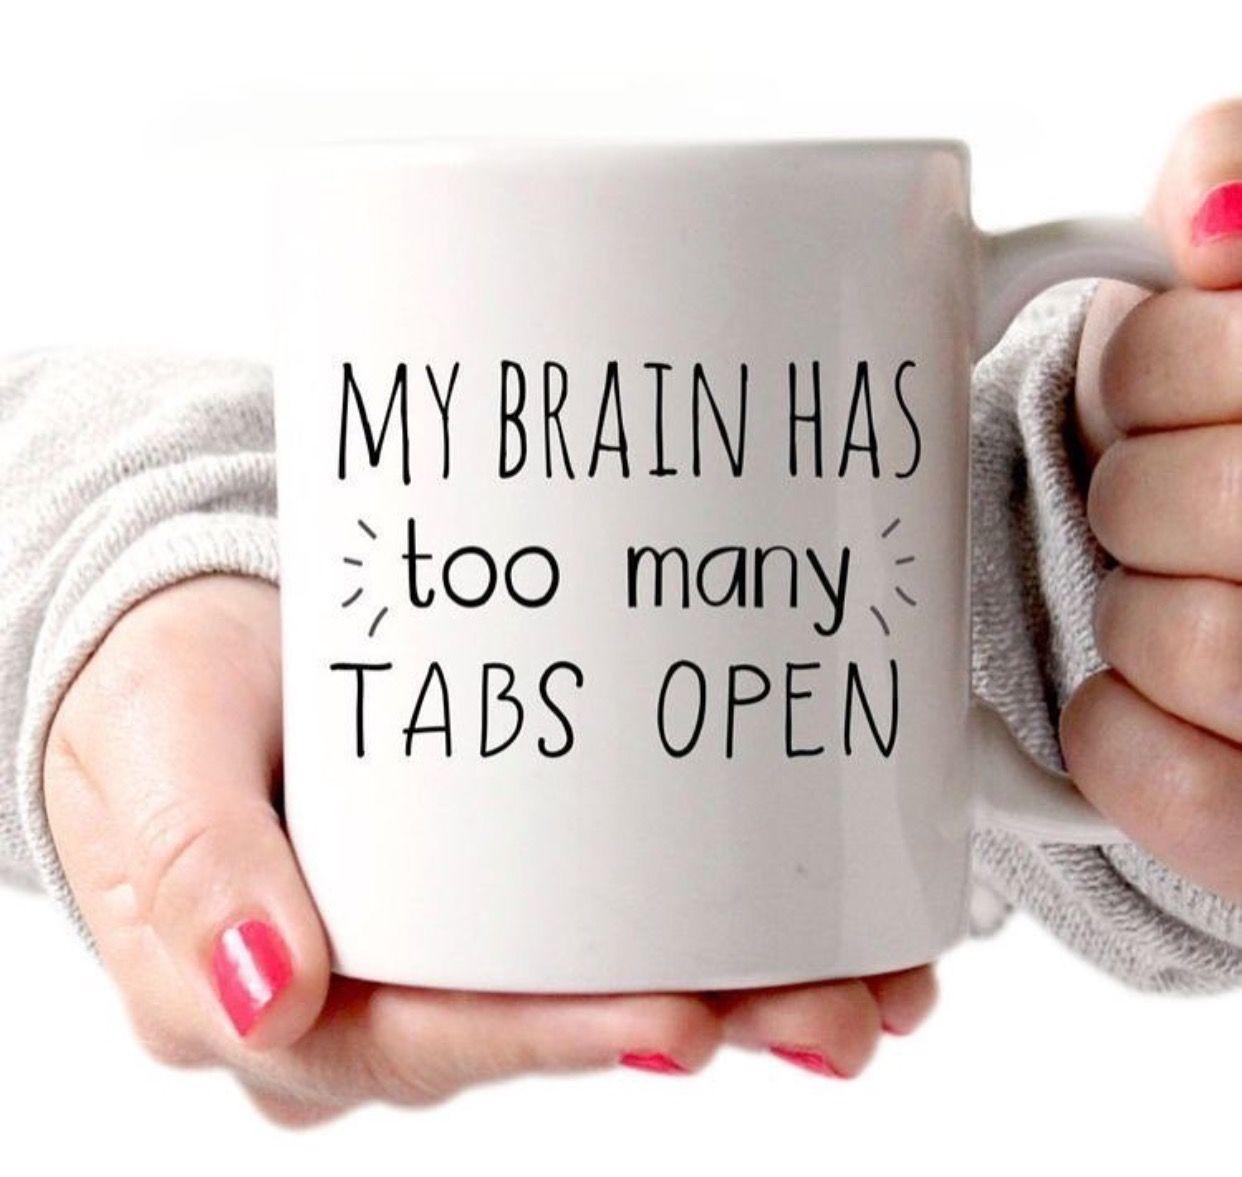 My Brain has too many tabs open! Courtesy of www.HupkaTeam.com Stafford, VA Real Estate.